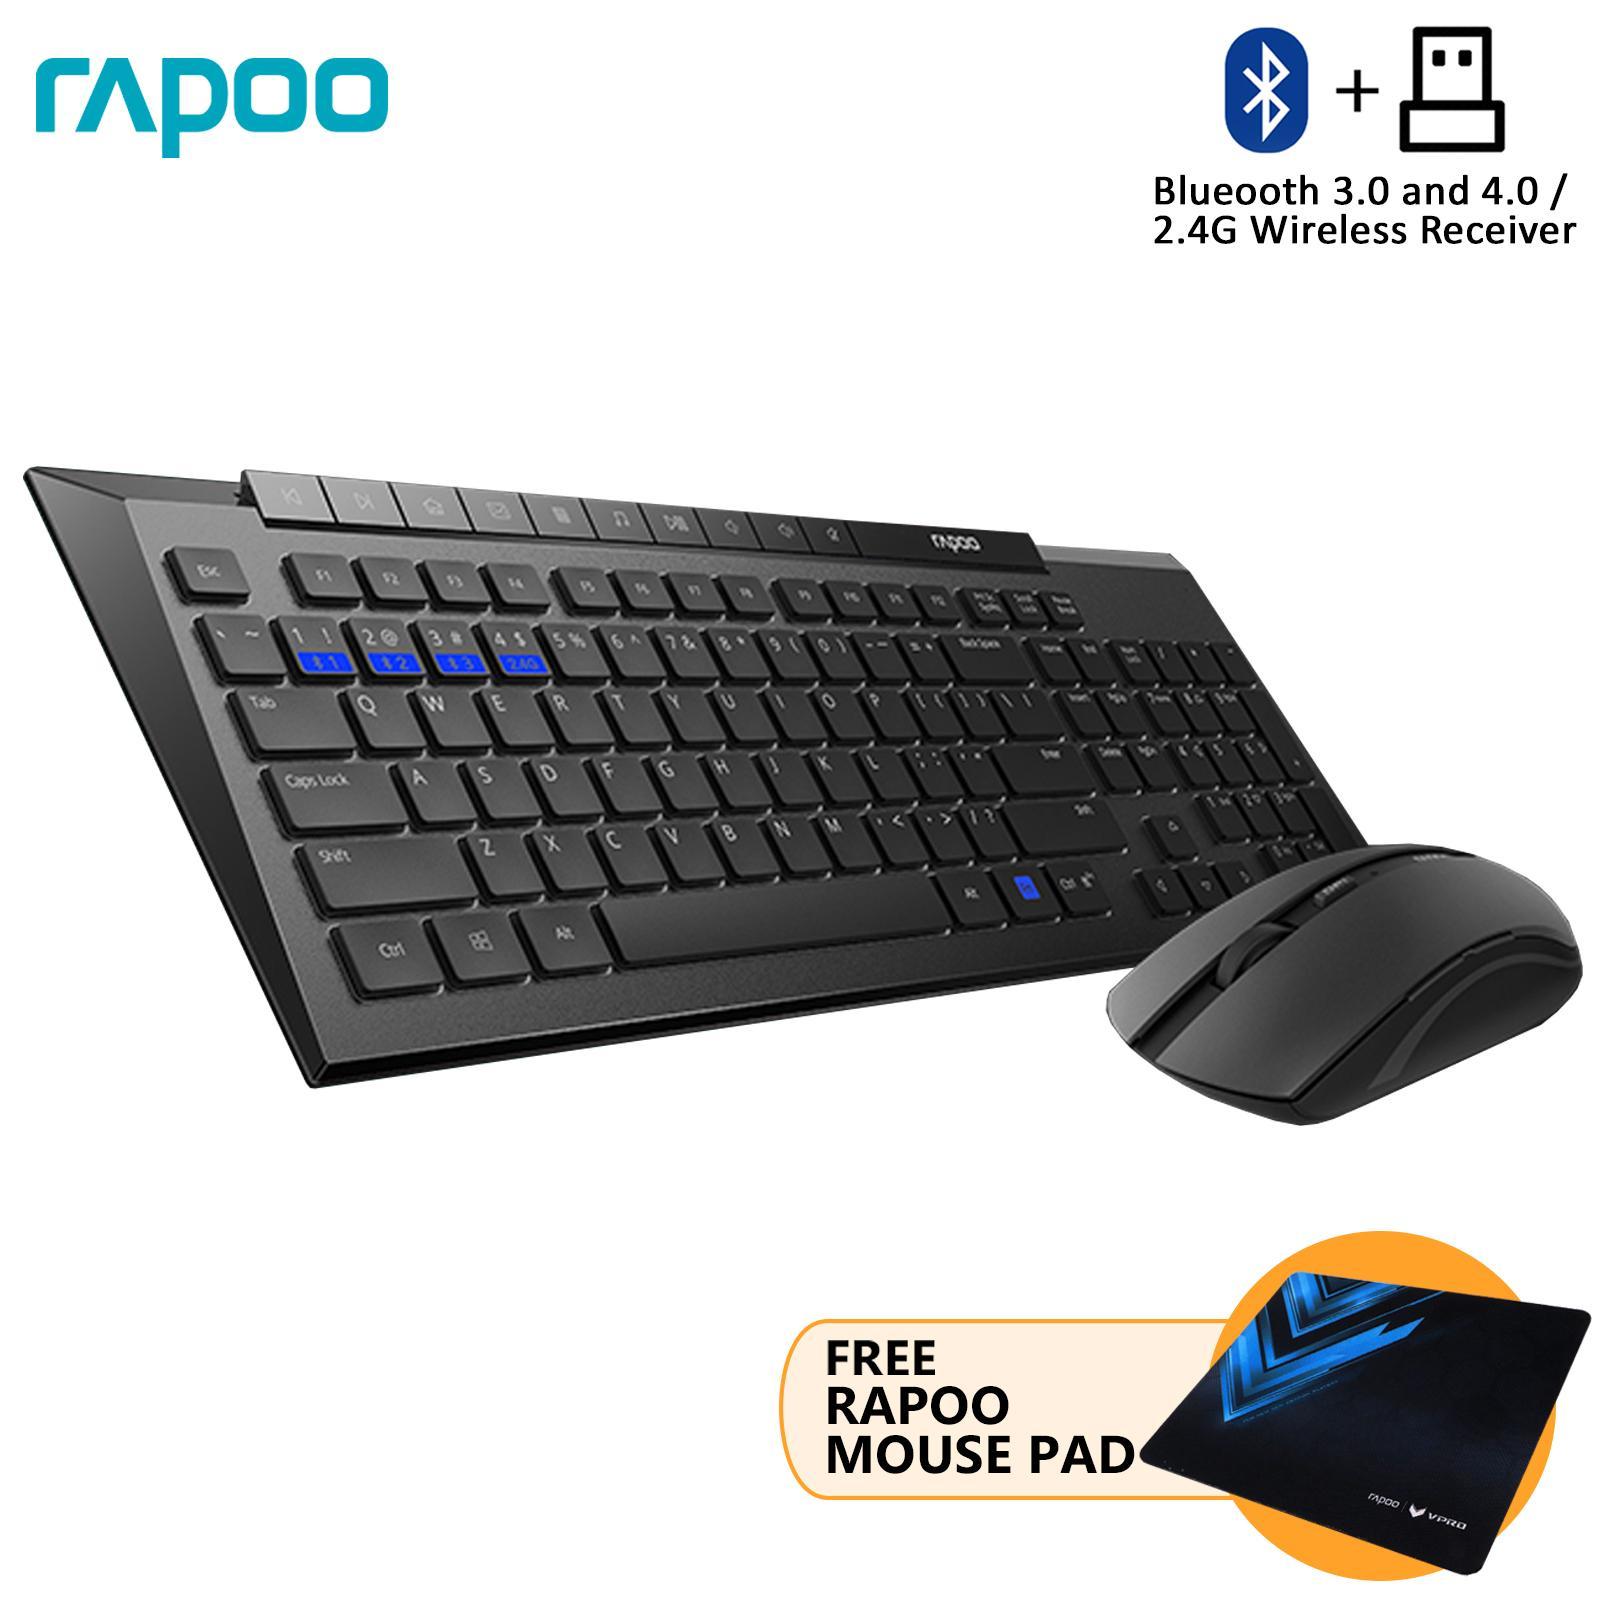 938652209ff RAPOO 8200M Bluetooth 3.0 Multi-mode 2.4G Wireless Keyboard & Mouse FREE  Mouse Pad